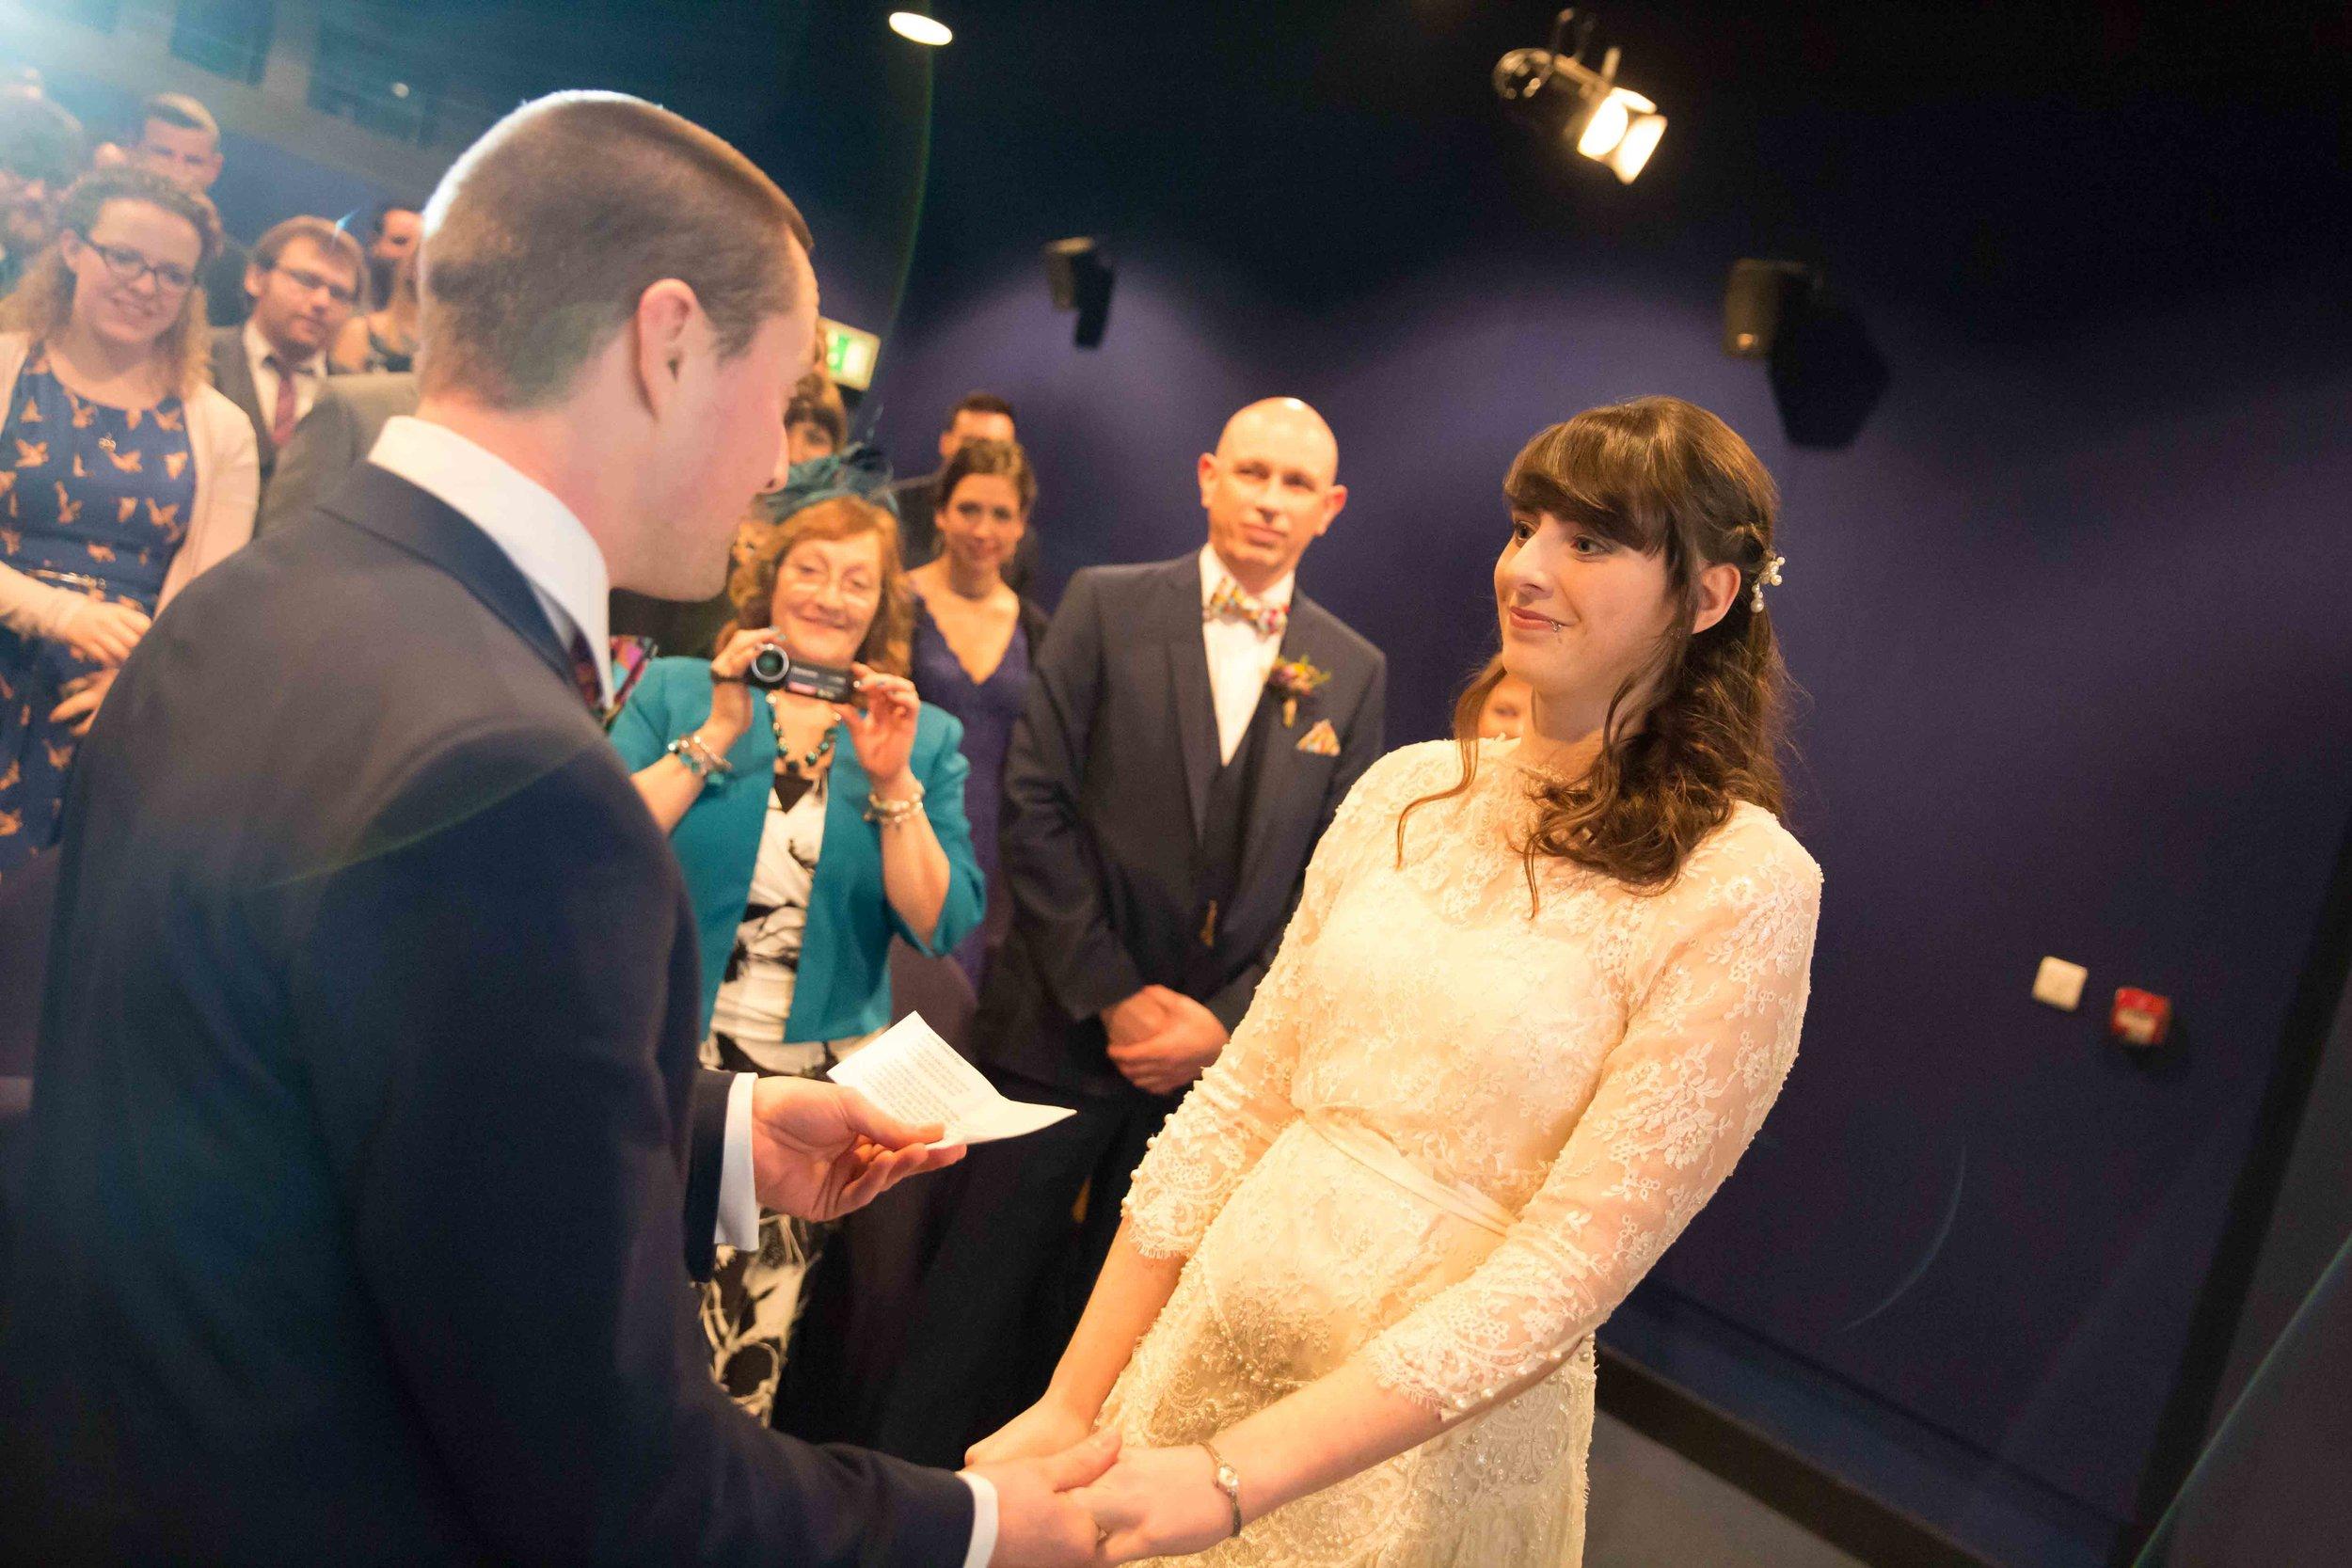 Adam & Faye - Wright Wedding Photography - Bristol Wedding Photographer -106.jpg